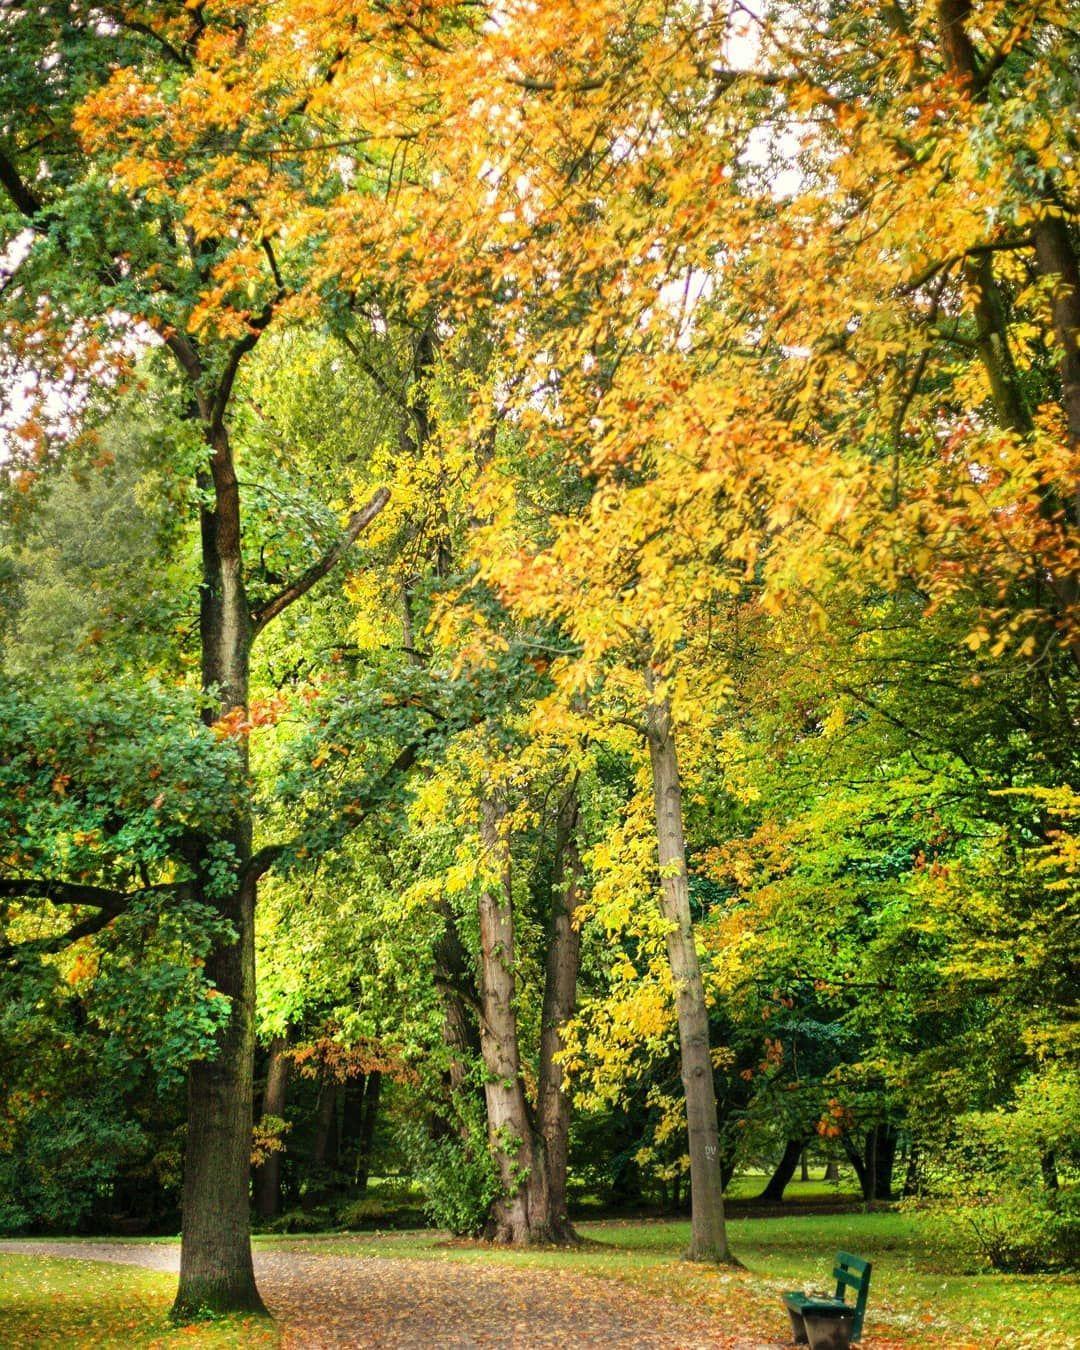 Autumn lights. Kassel, Karlsaue.  Photographer: @salogwyn_fine_Art  #nature #naturelovers #casselfornia #kassel #kasselfornia #wonderful_places #wonderfullife #beautifulnature #beautifullight #motherearth #worldbestshot #seascape #photography #divine_worldplaces #challenge #photooftheday #photoshoot #colorful #gurushotschallenge #gurushots #shotaward #ig_mood #autumn #autumnvibes🍁 #amazing_shots #tree_pictures #tree_magic #tree_love #color #colorful #yellow